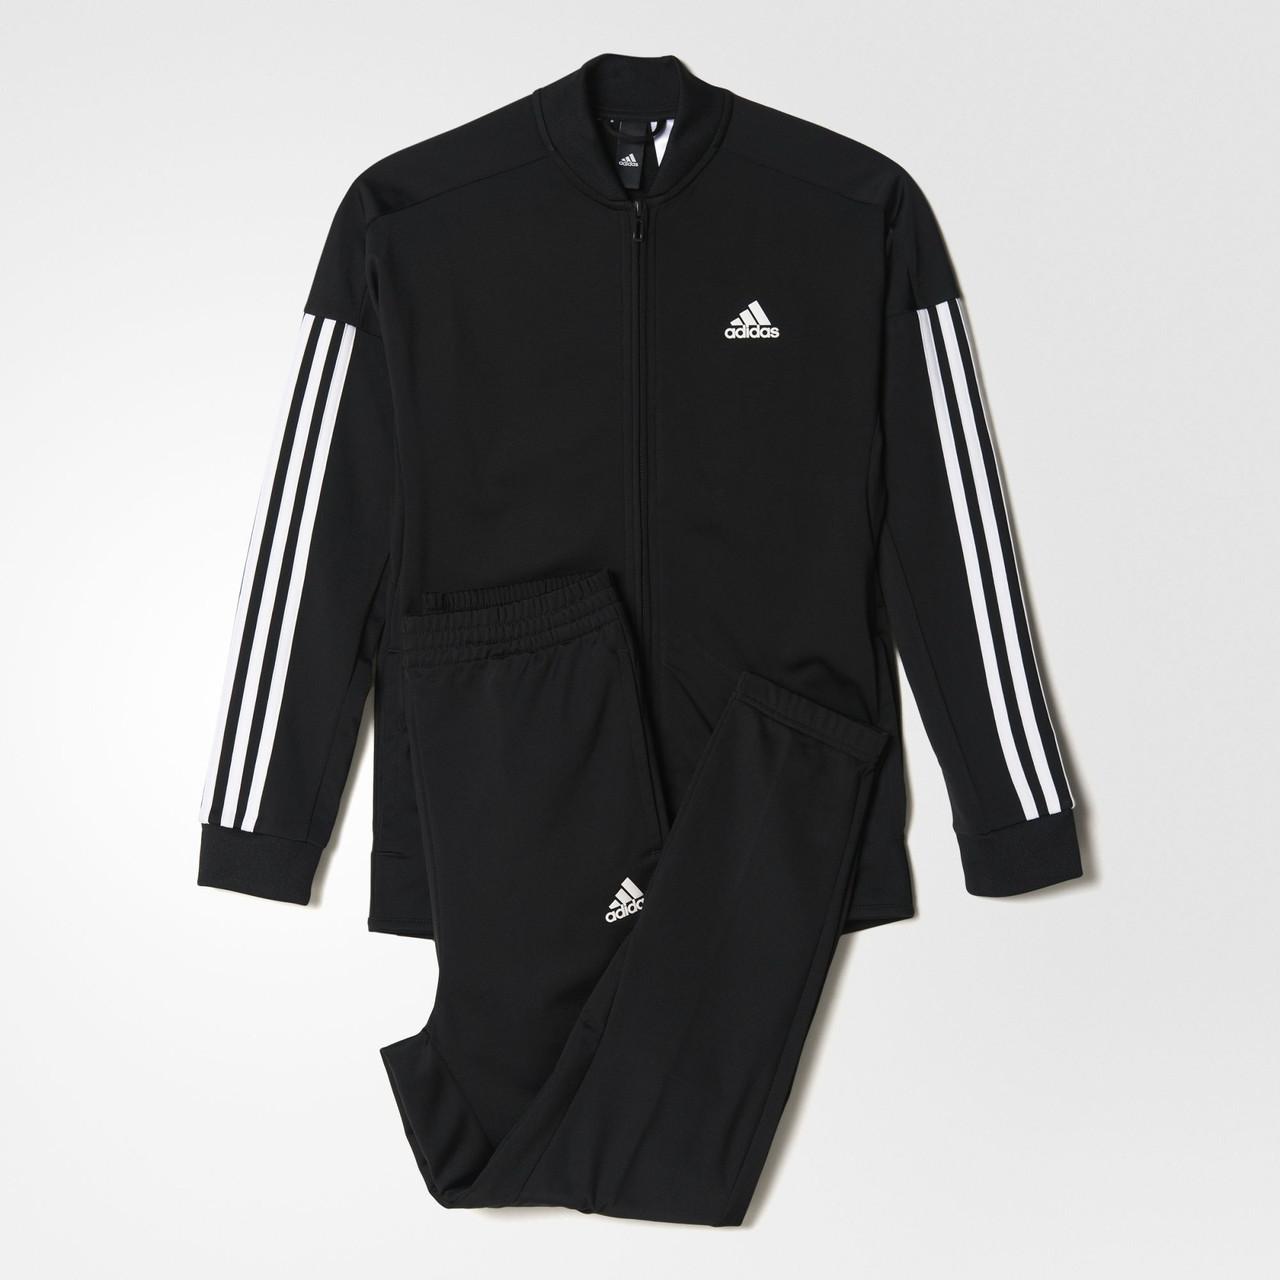 7c04bd3699b6 Детский спортивный костюм Adidas Performance Iconic (Артикул  BQ3003) -  Интернет-магазин «